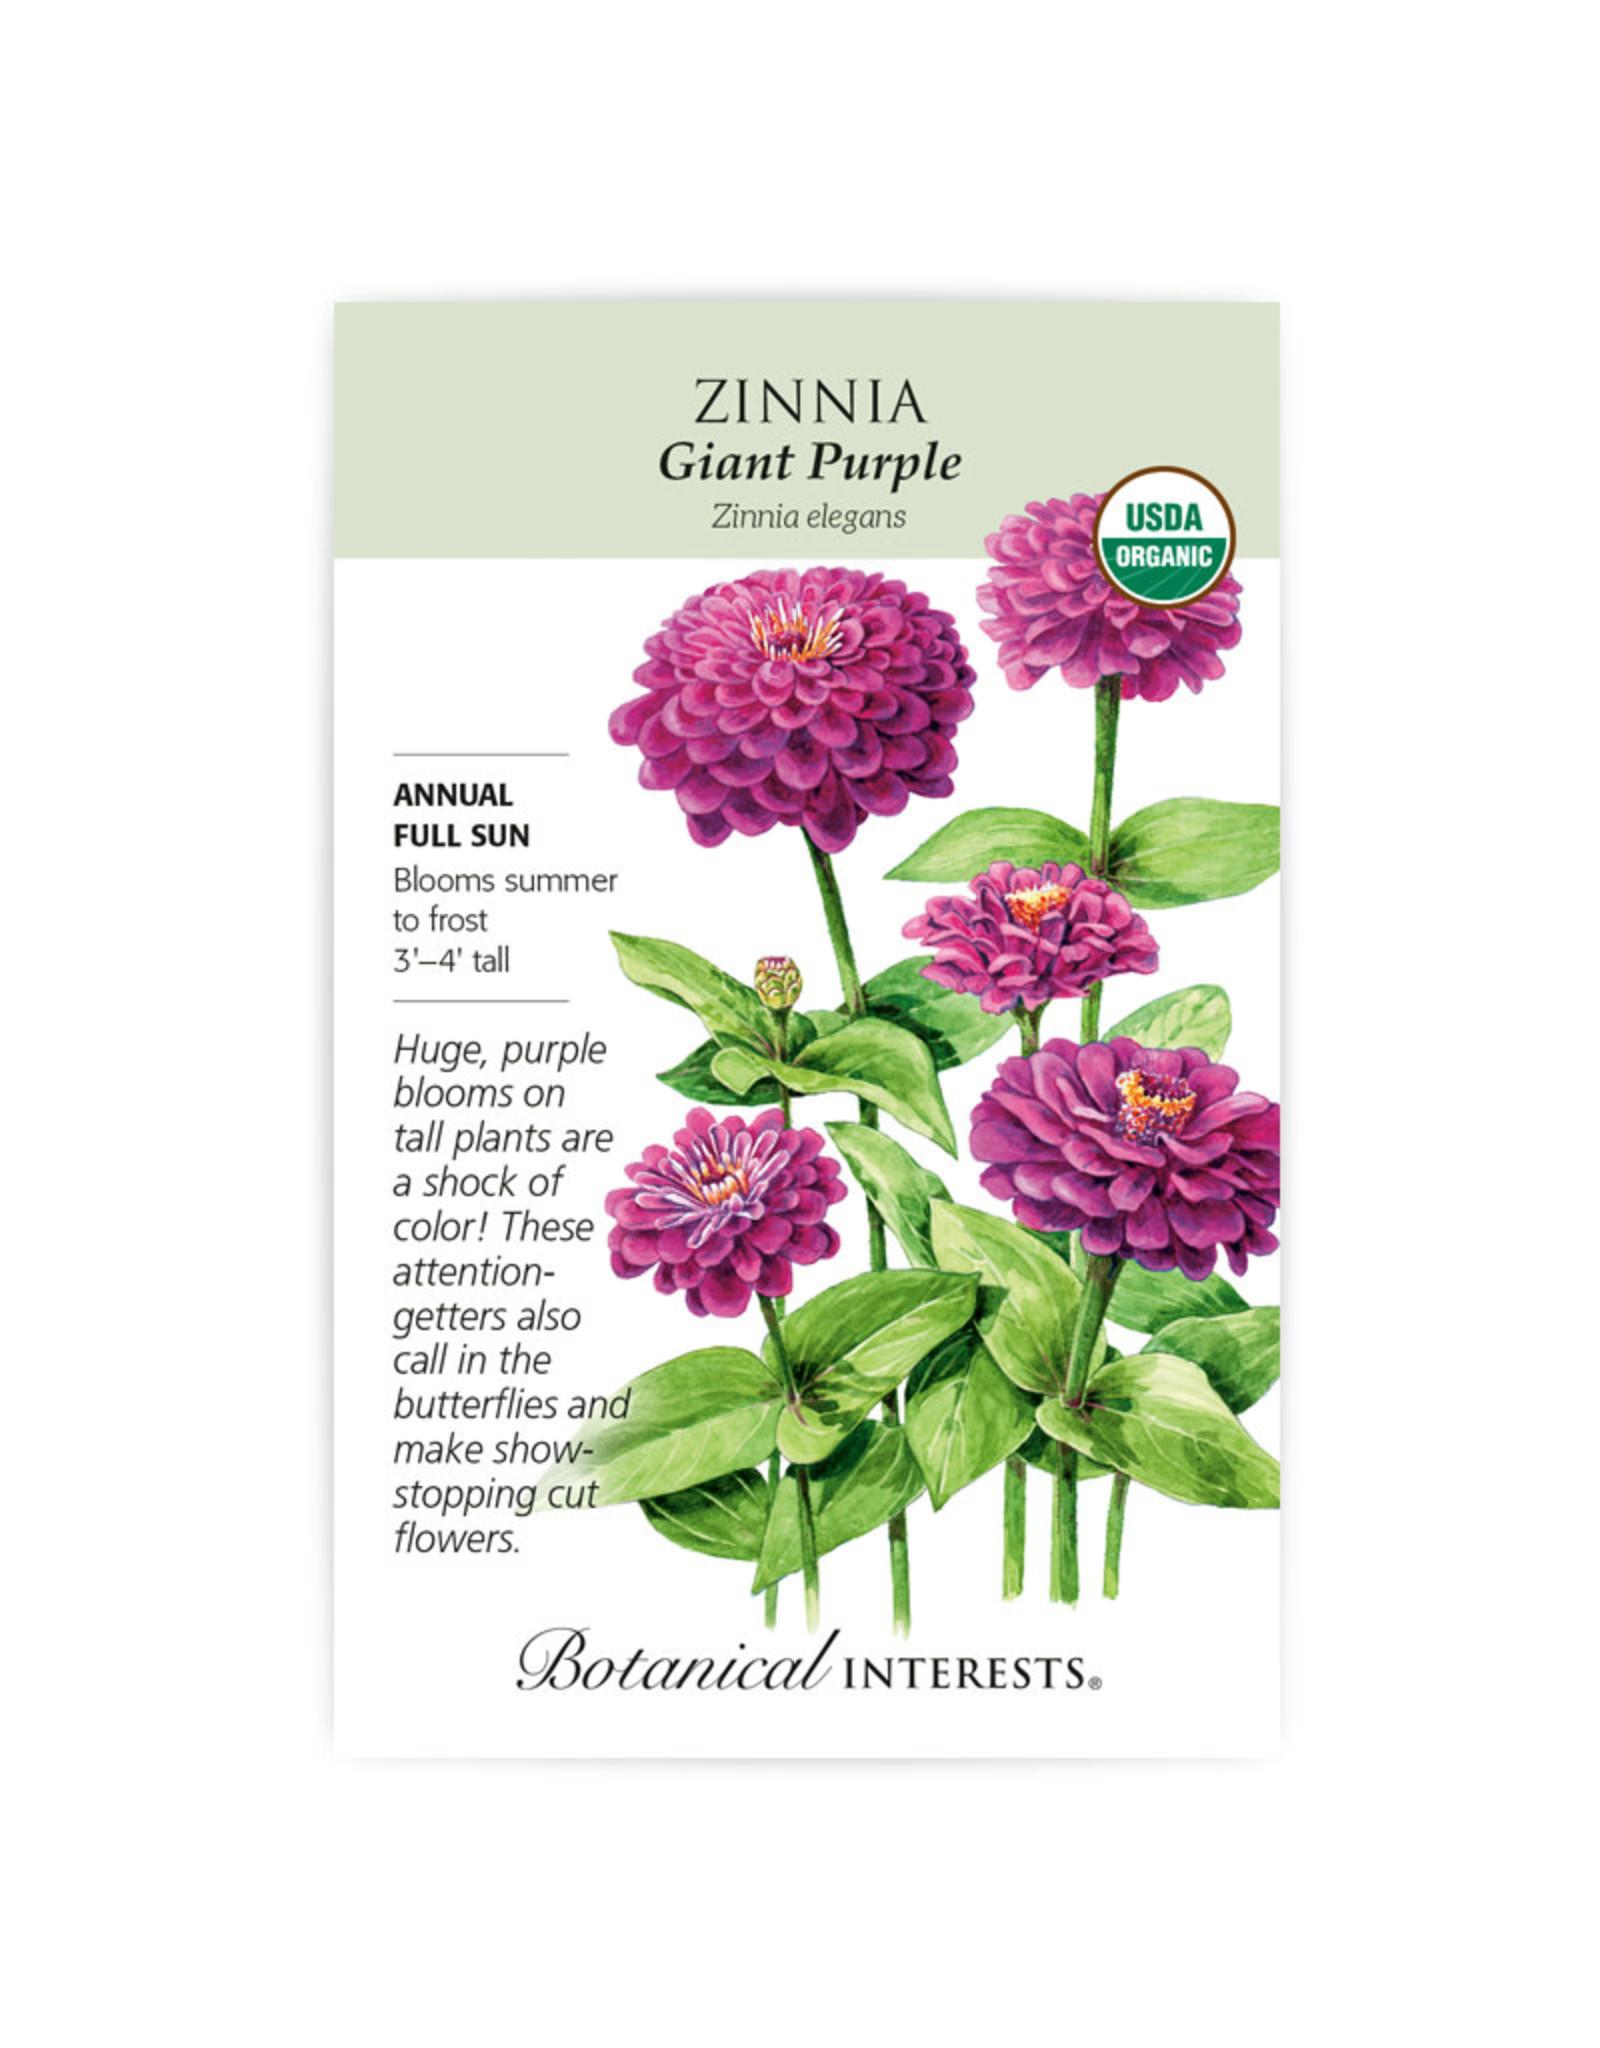 Seeds - Zinnia Giant Purple Organic